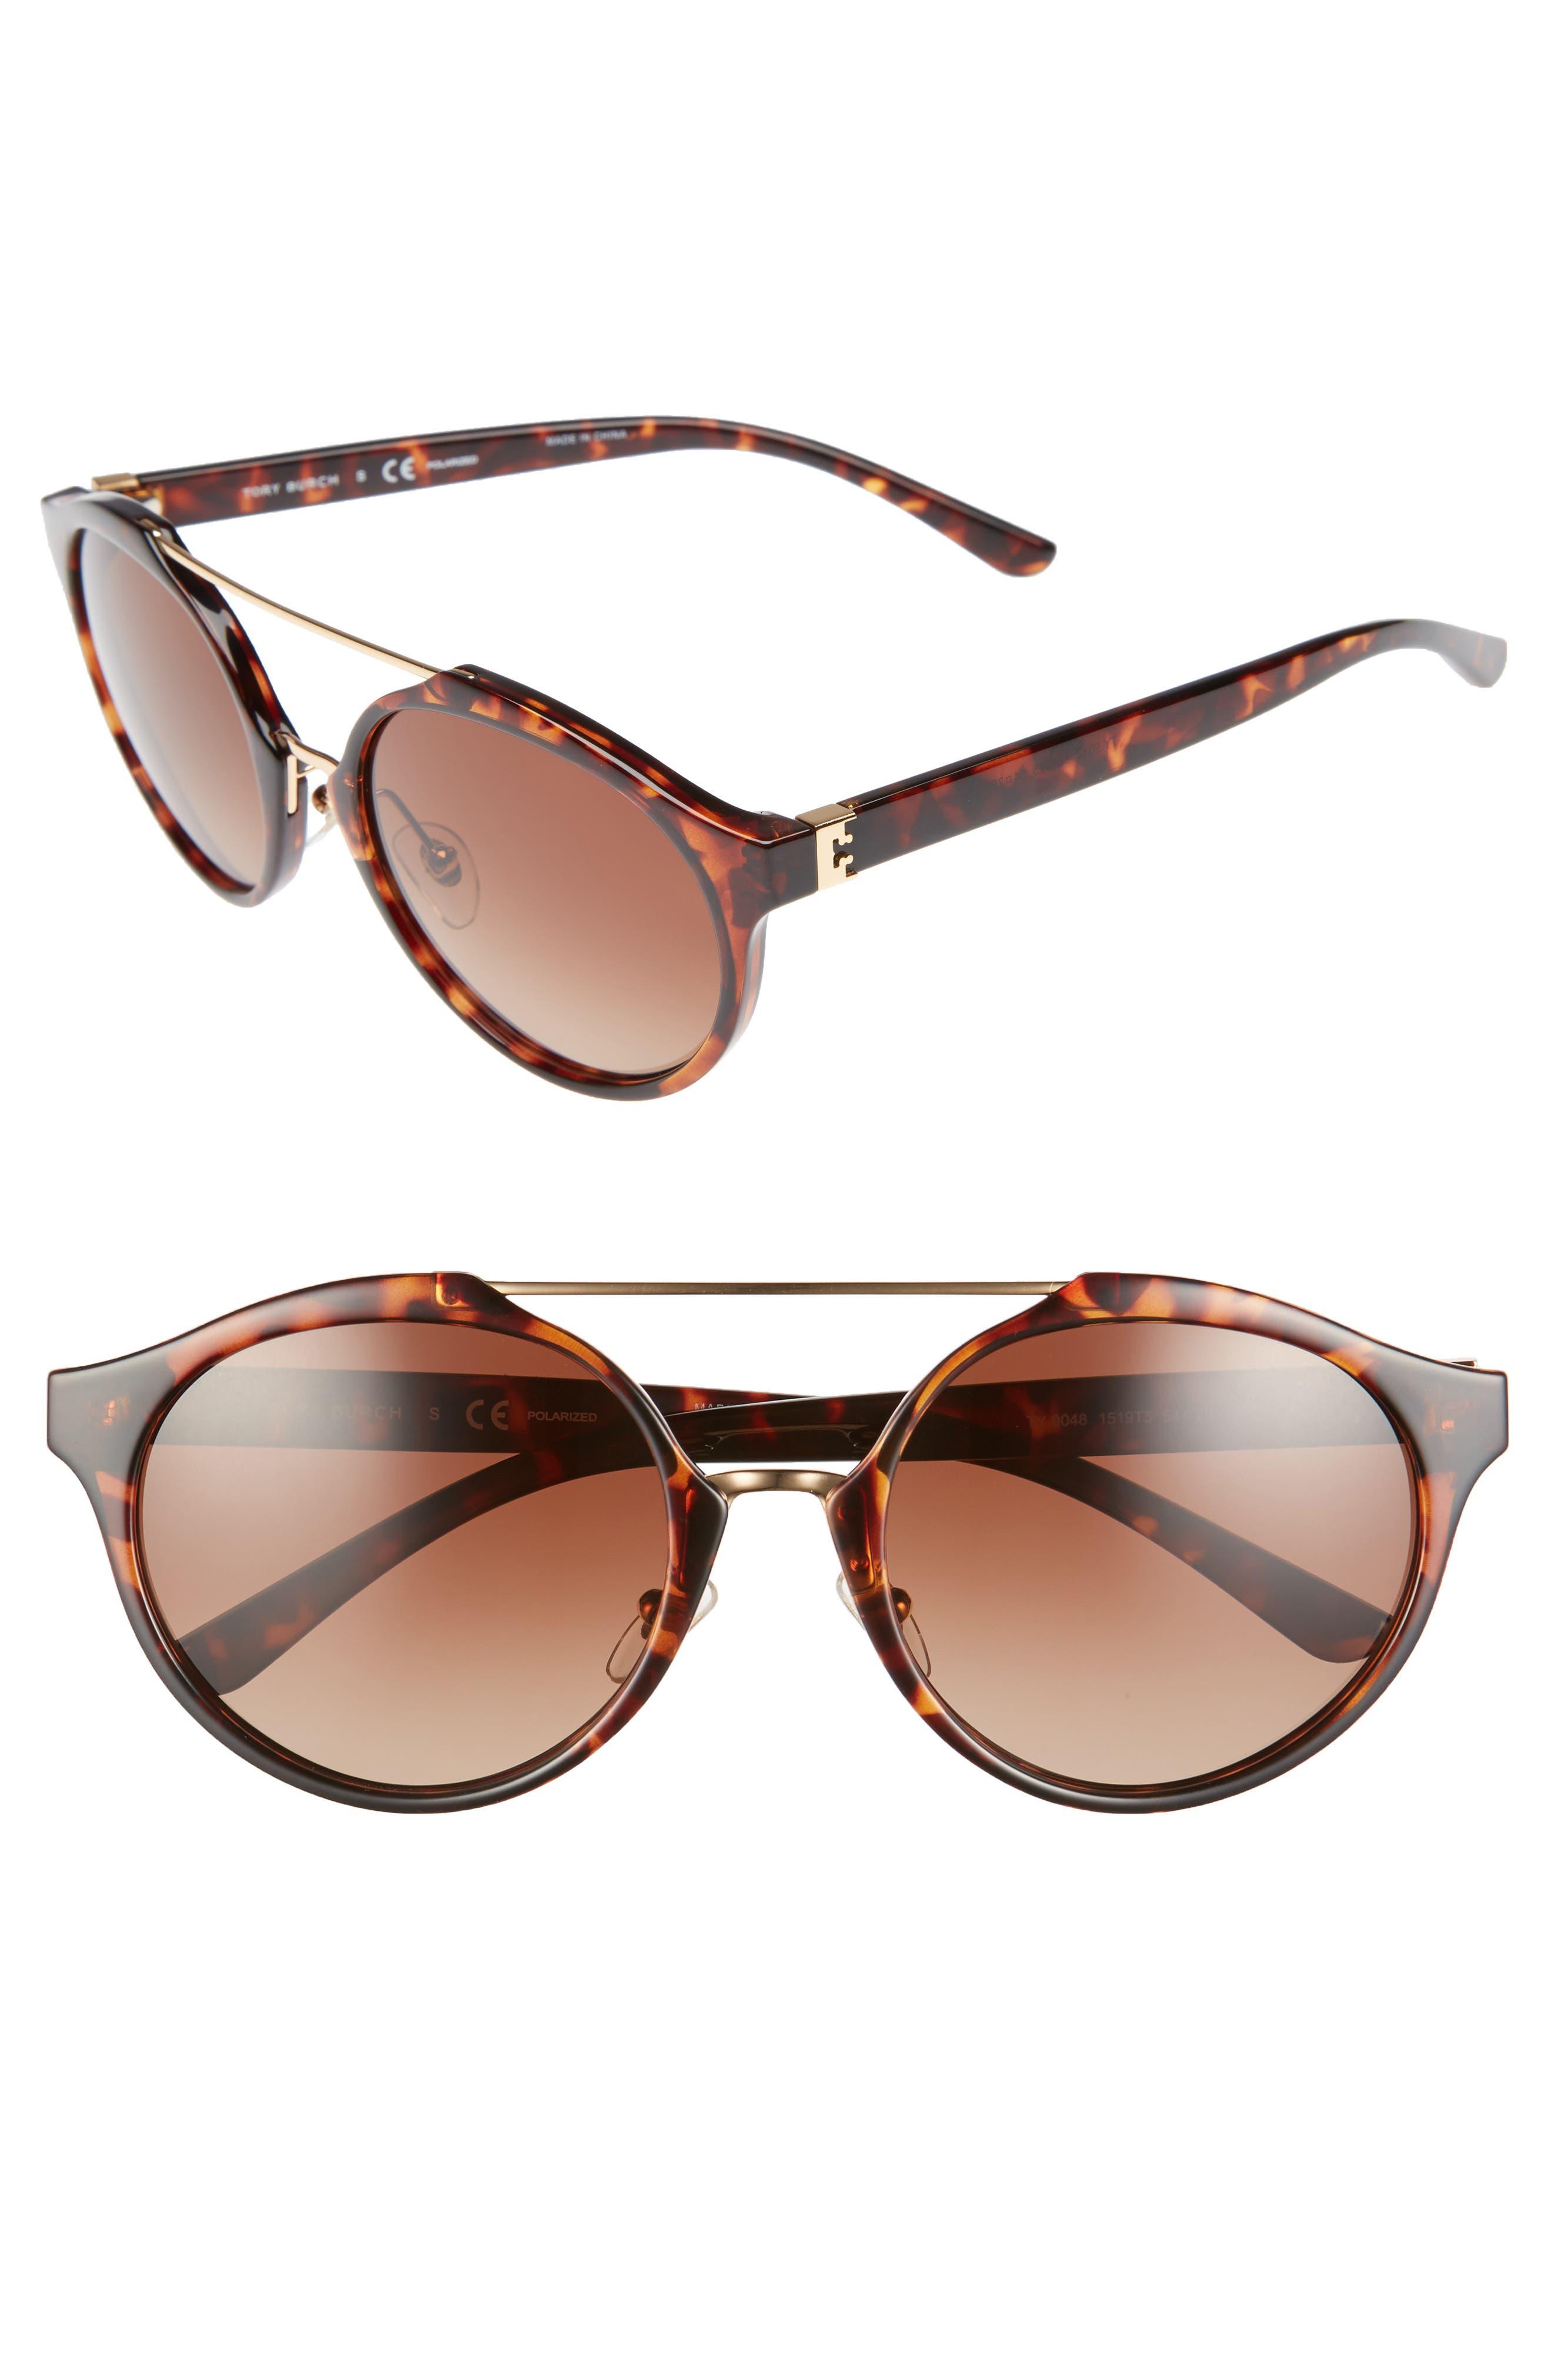 54mm Polarized Sunglasses,                         Main,                         color, Tortoise/ Polar